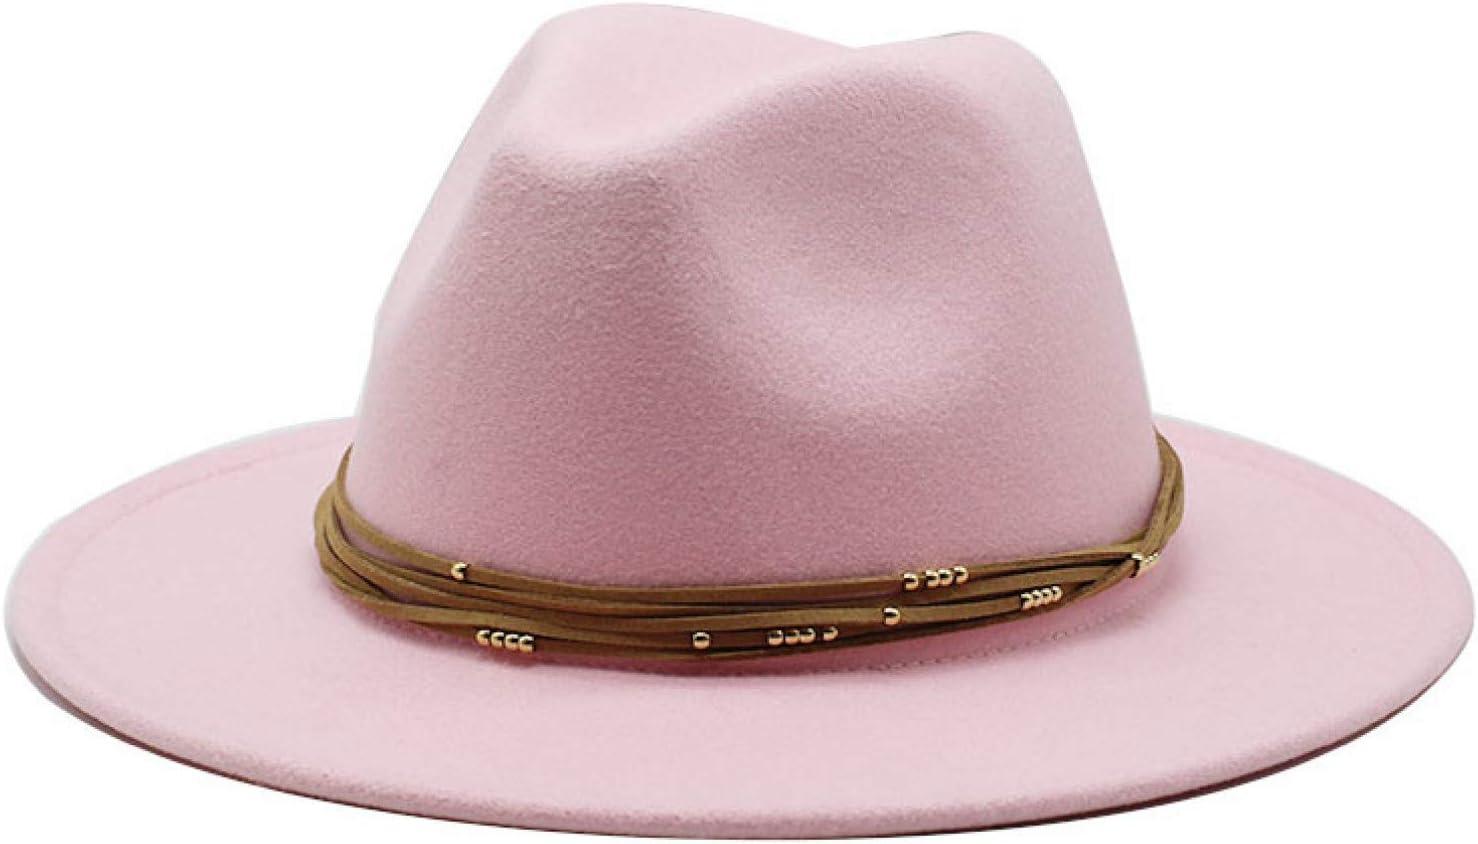 BAJIE Fedora 17 Color Vintage Retro Plain Dyed Wool Felt Black Ladies Hat Flat Brim Fedora Classic Unisex Jazz